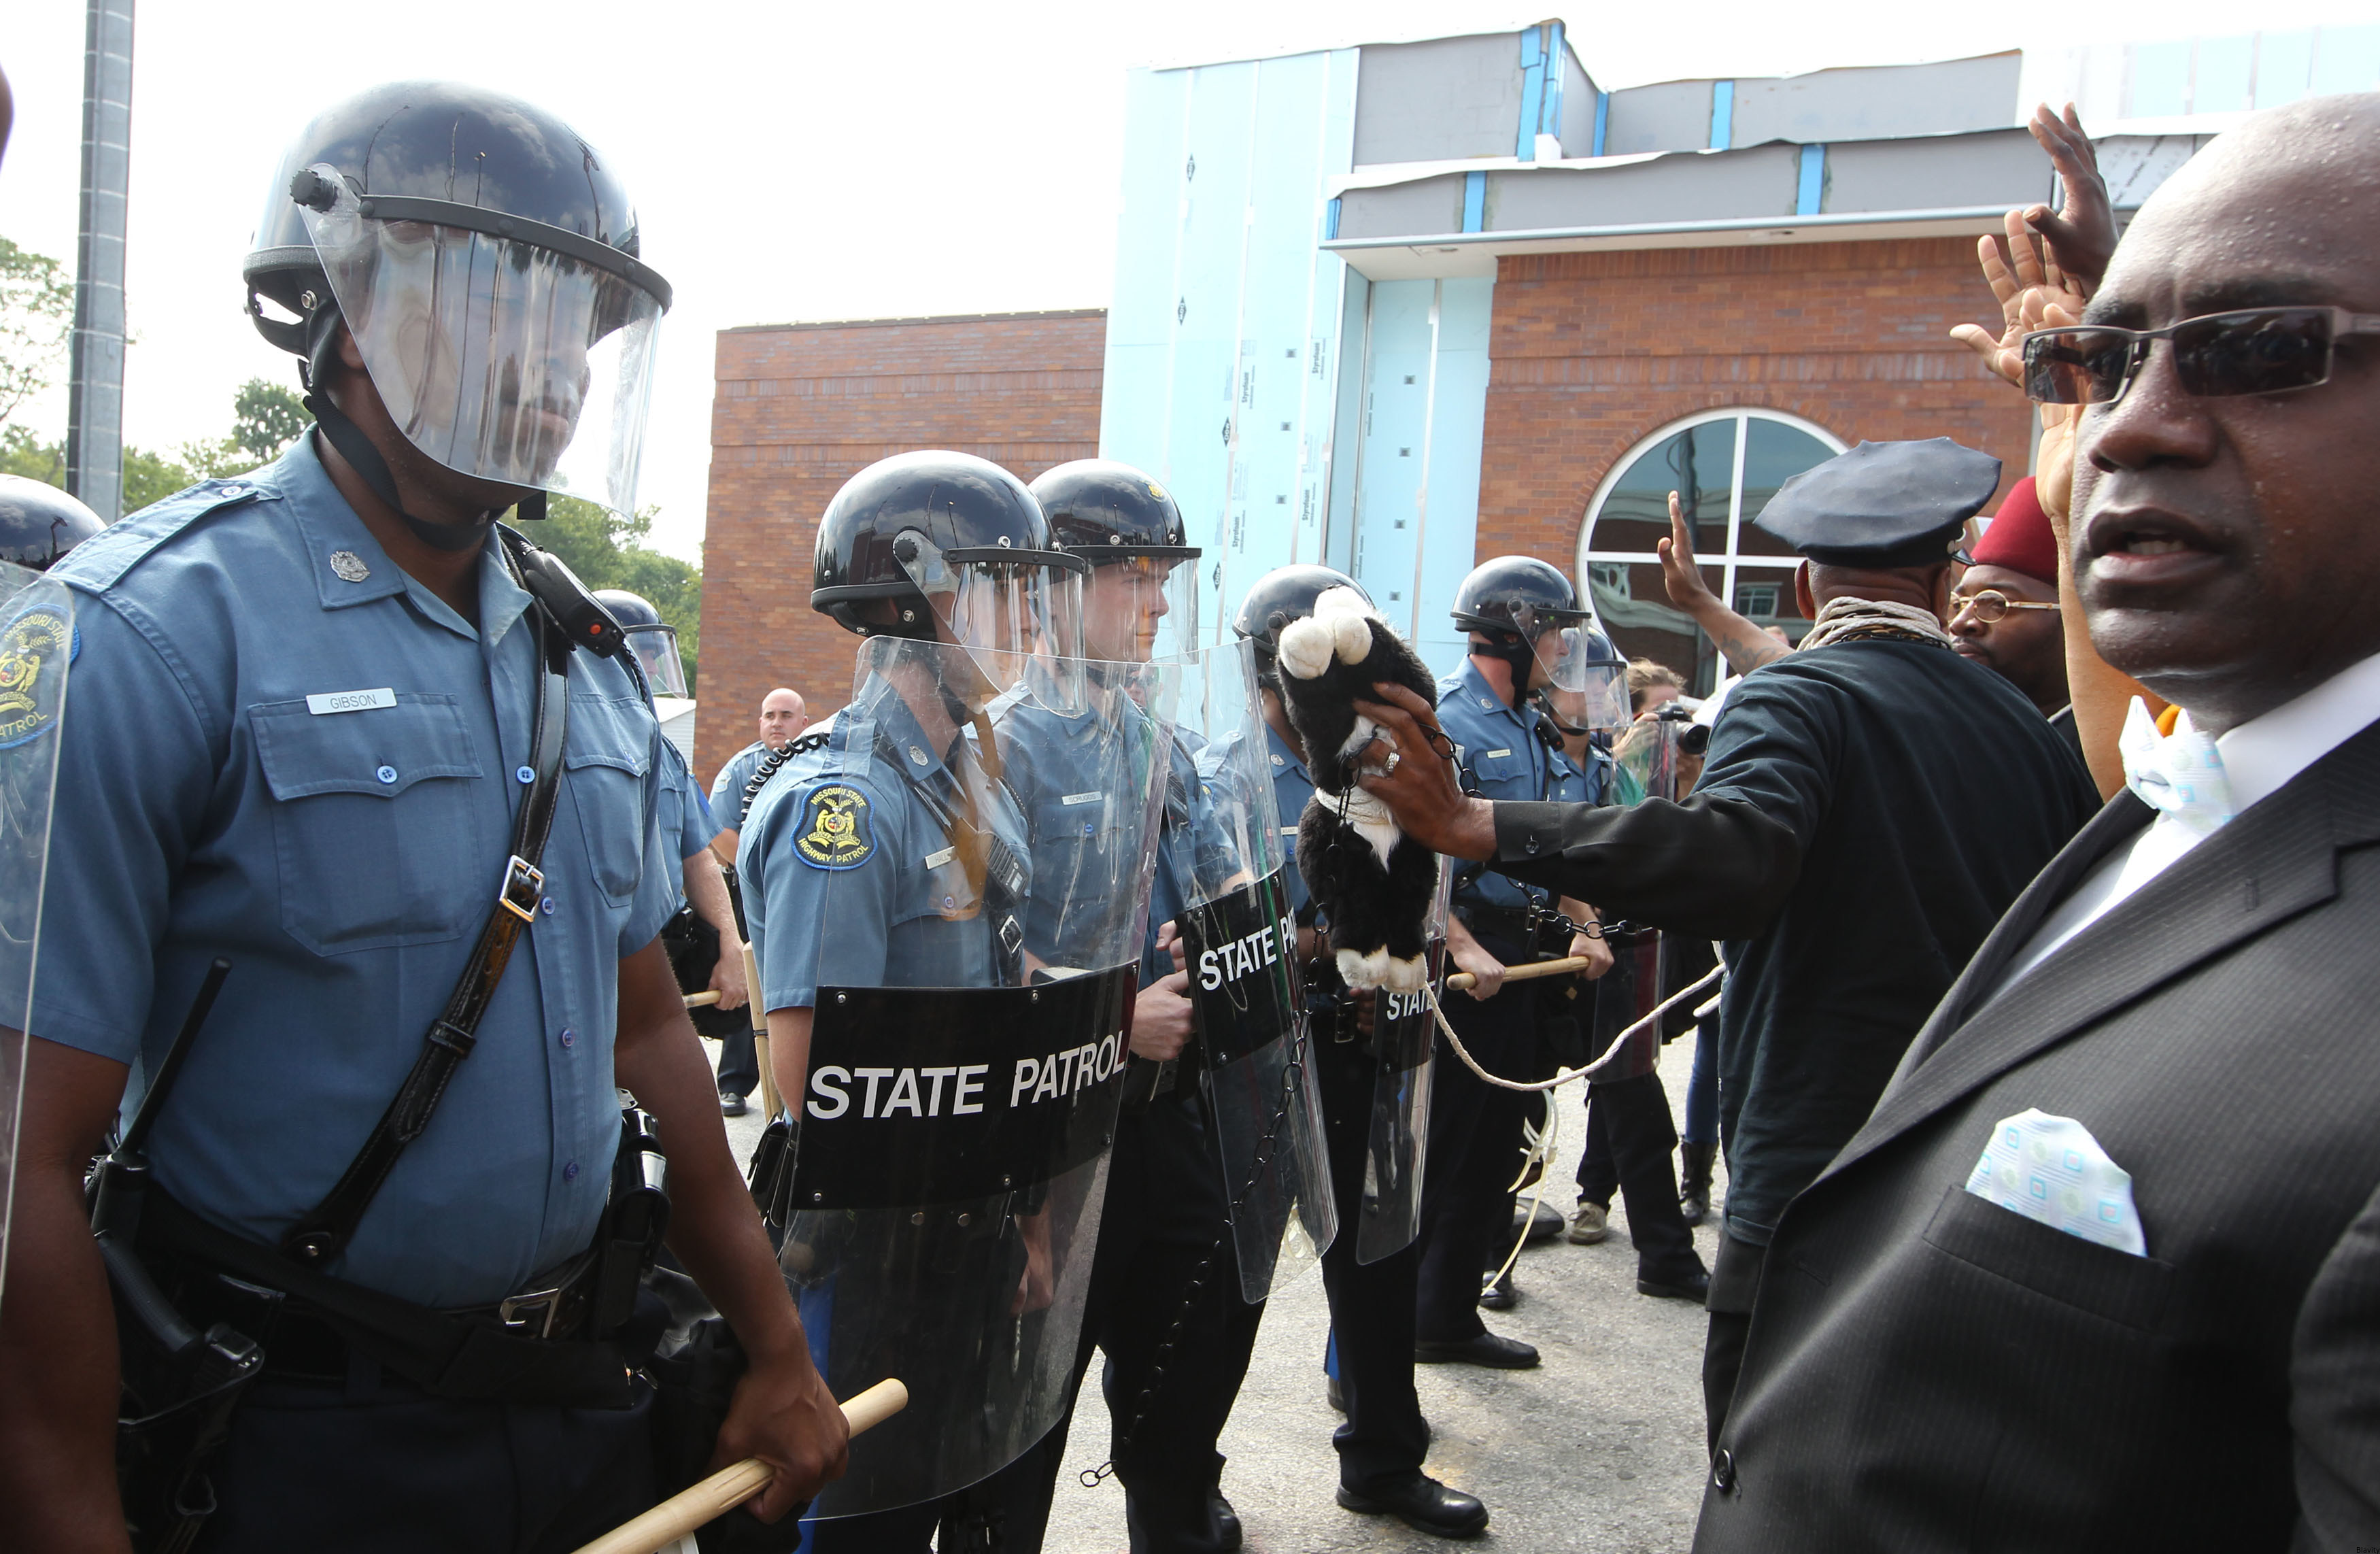 Photo: St. Louis Public Radio